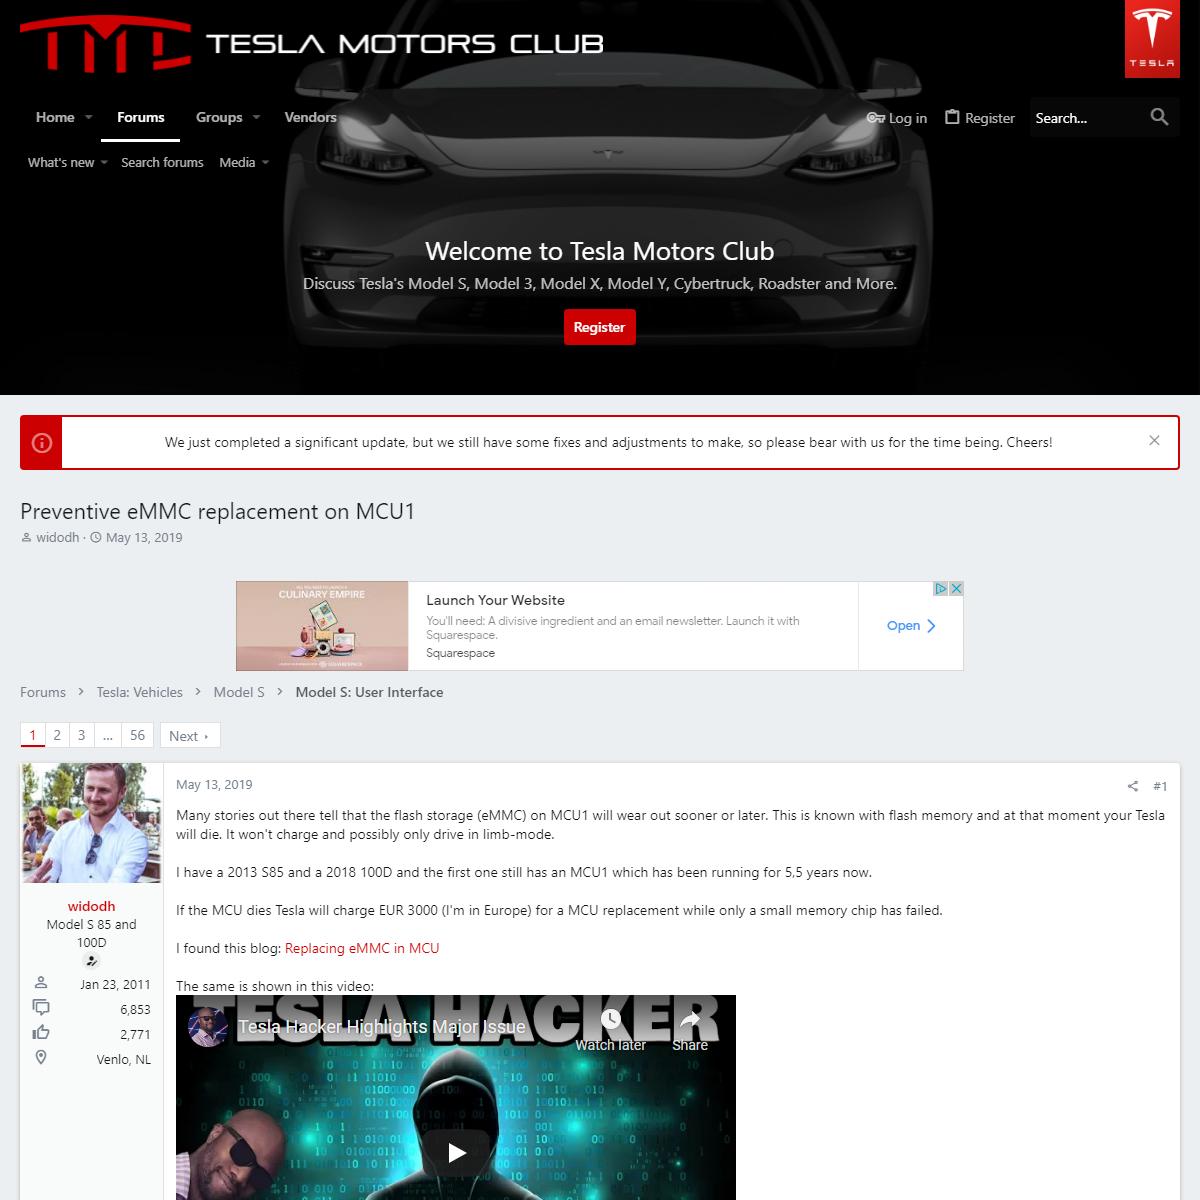 Preventive eMMC replacement on MCU1 - Tesla Motors Club